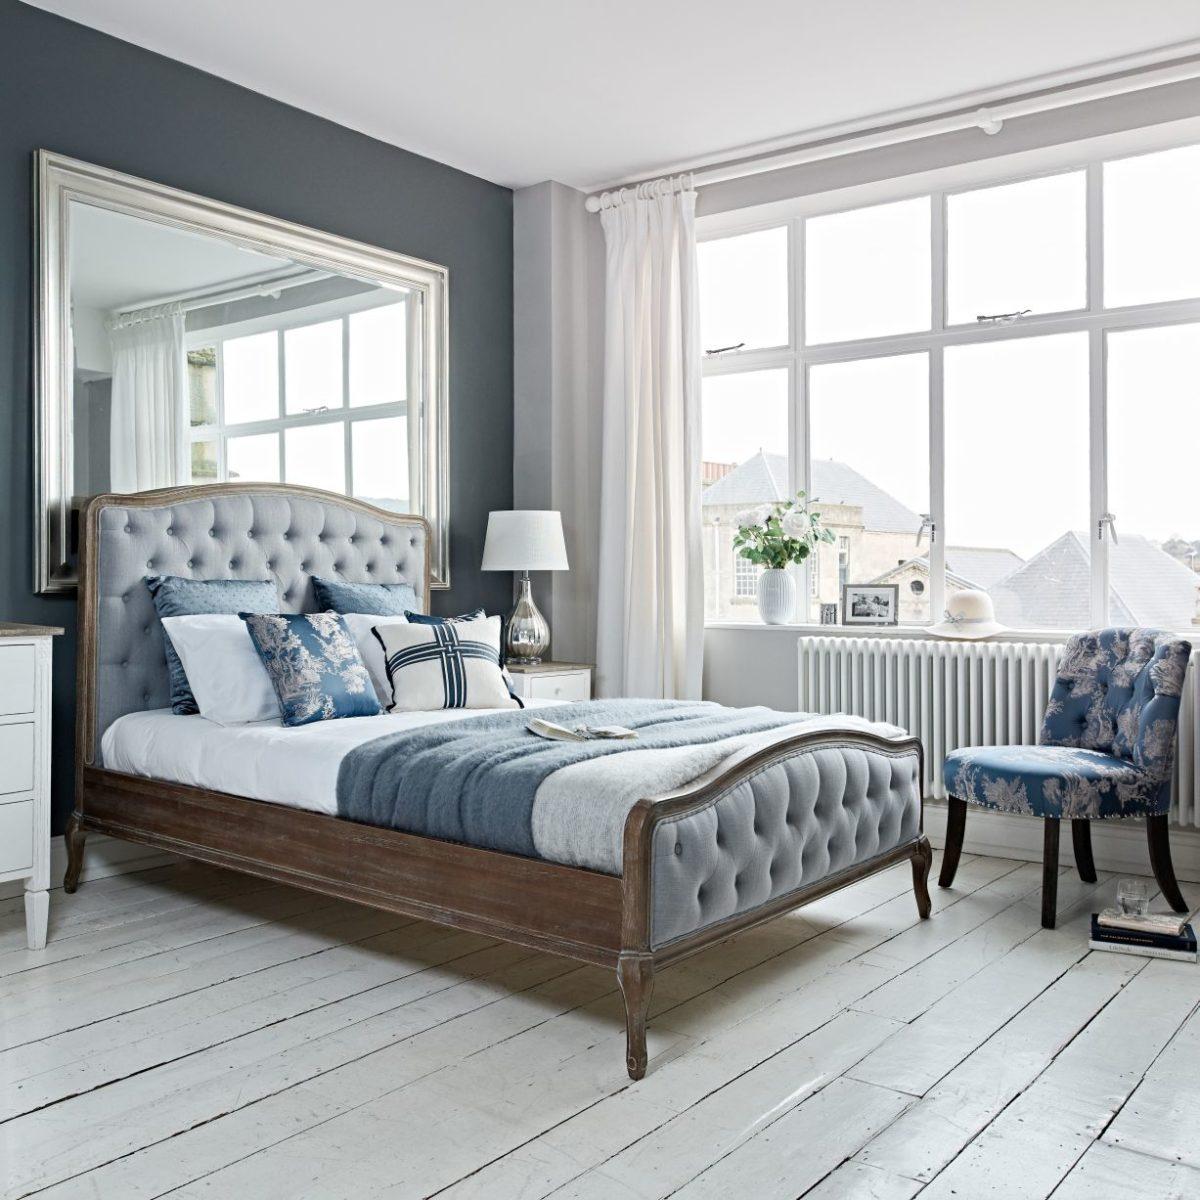 2brissi_blue_bedroom_lifestyles_01-1200x1200.jpg